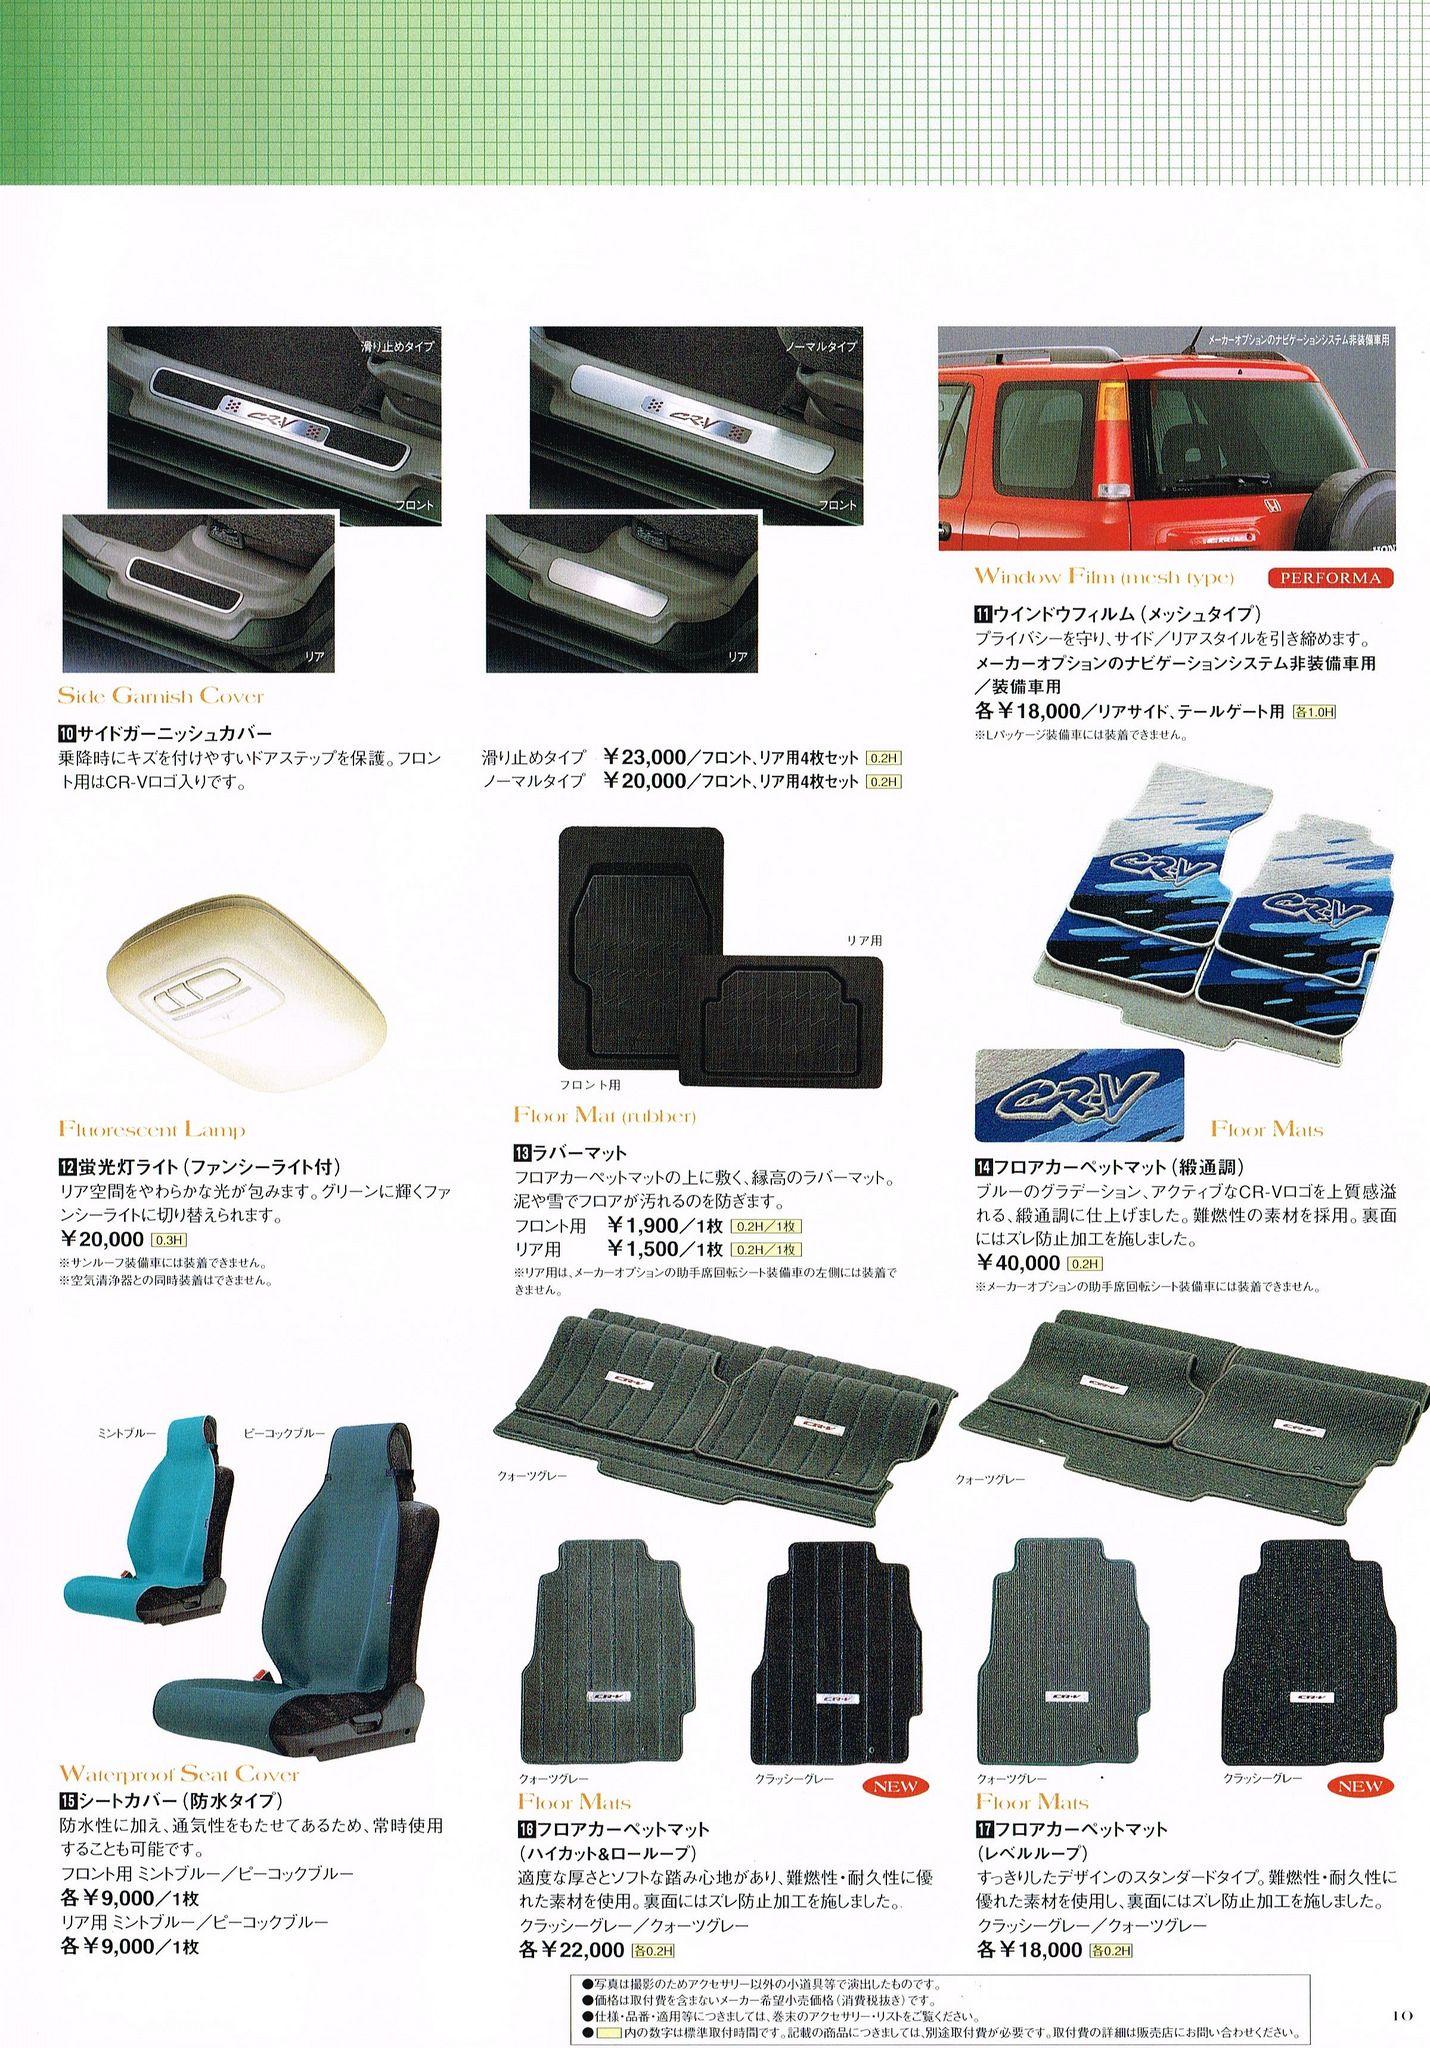 Honda Cr V Mk1 Japan Accessory Brochure 1999 Honda Honda Crv Honda Cr